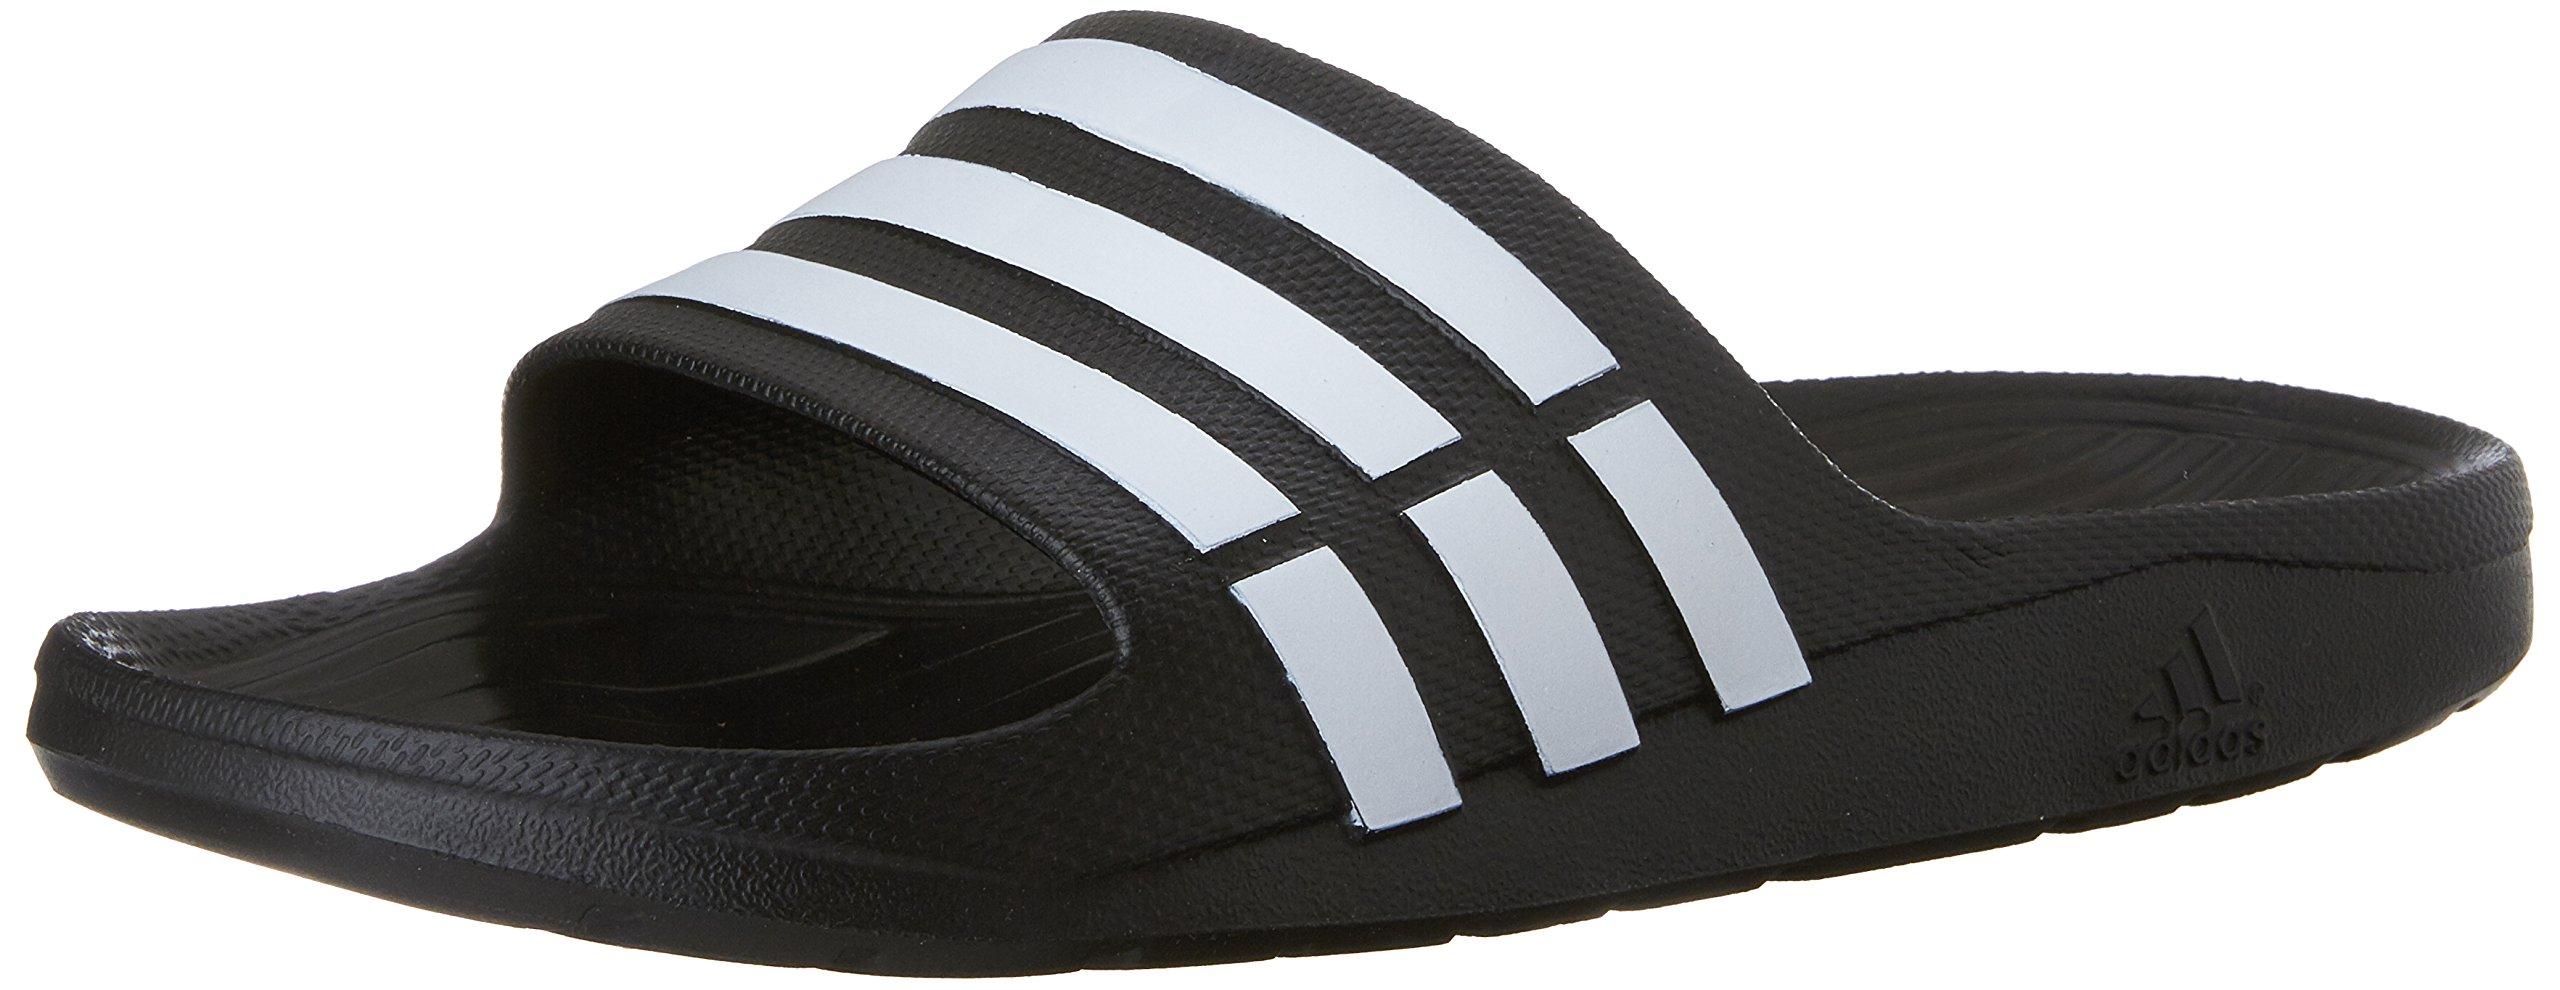 adidas Duramo Slide Sandal,Black/White/Black,13 M US